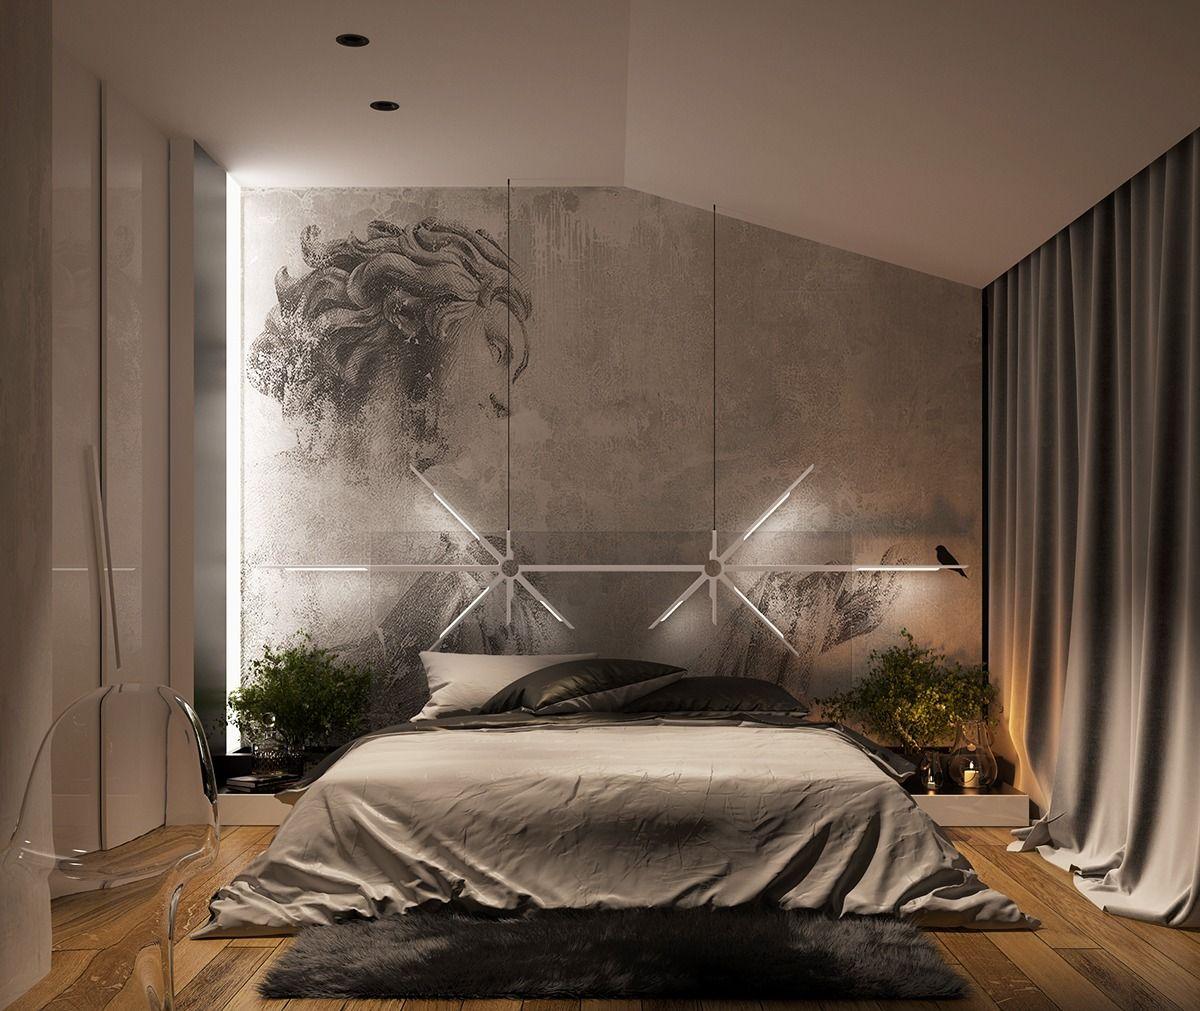 Lucite Bedroom Chair Interior Design Ideas Modern Bedroom Design Bedroom Wall Designs Luxurious Bedrooms